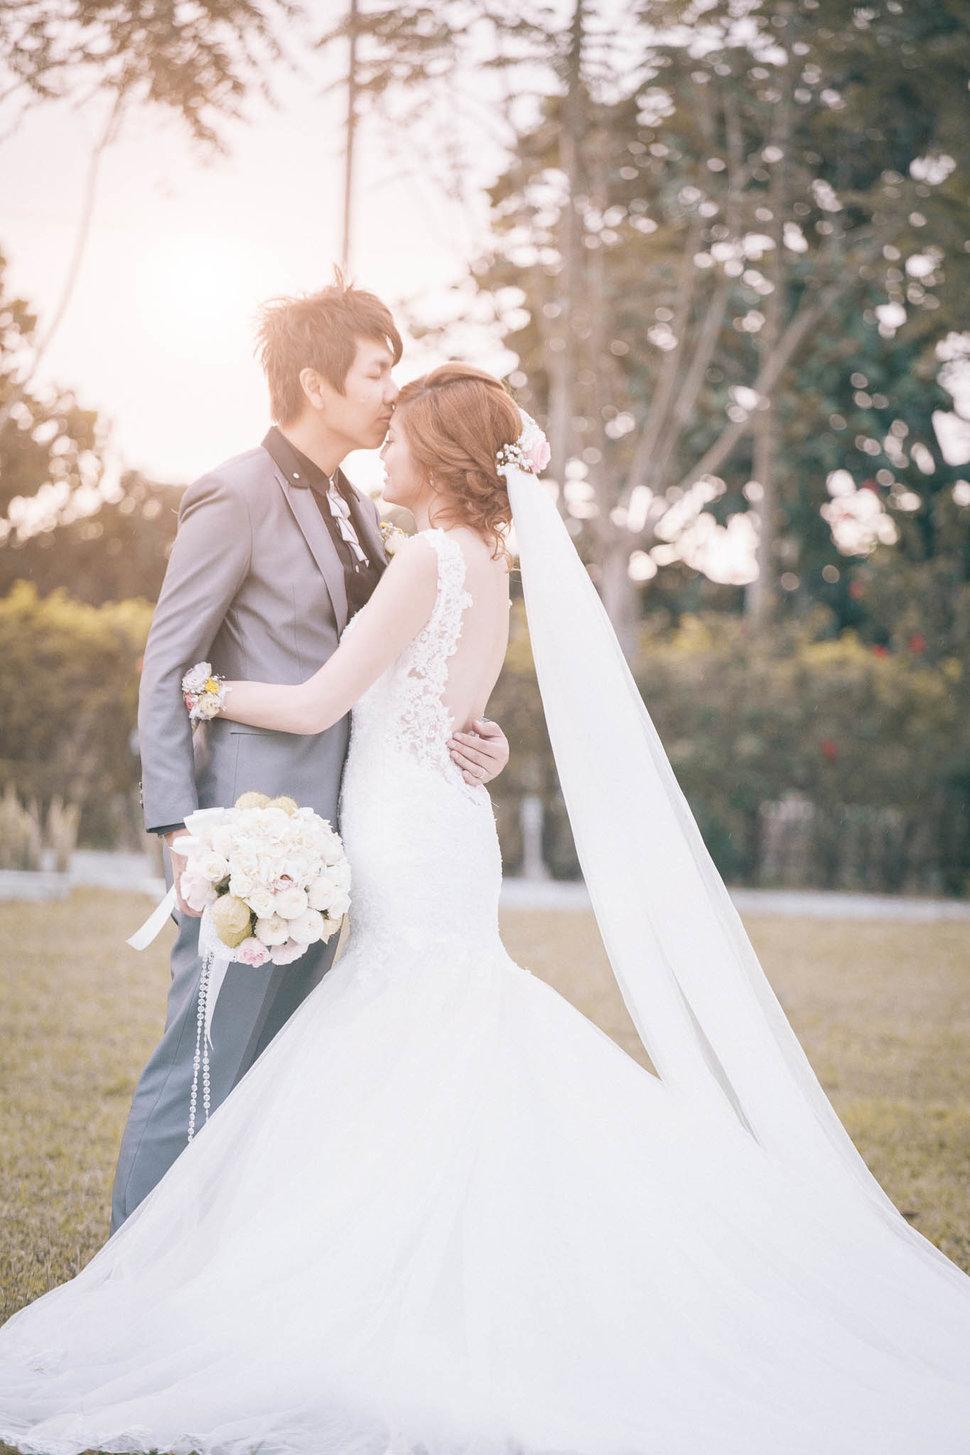 18PHOTO-大育❤️ 小汝(花園婚禮)(編號:226009) - 18PHOTO 婚紗影像攝影工作室 - 結婚吧